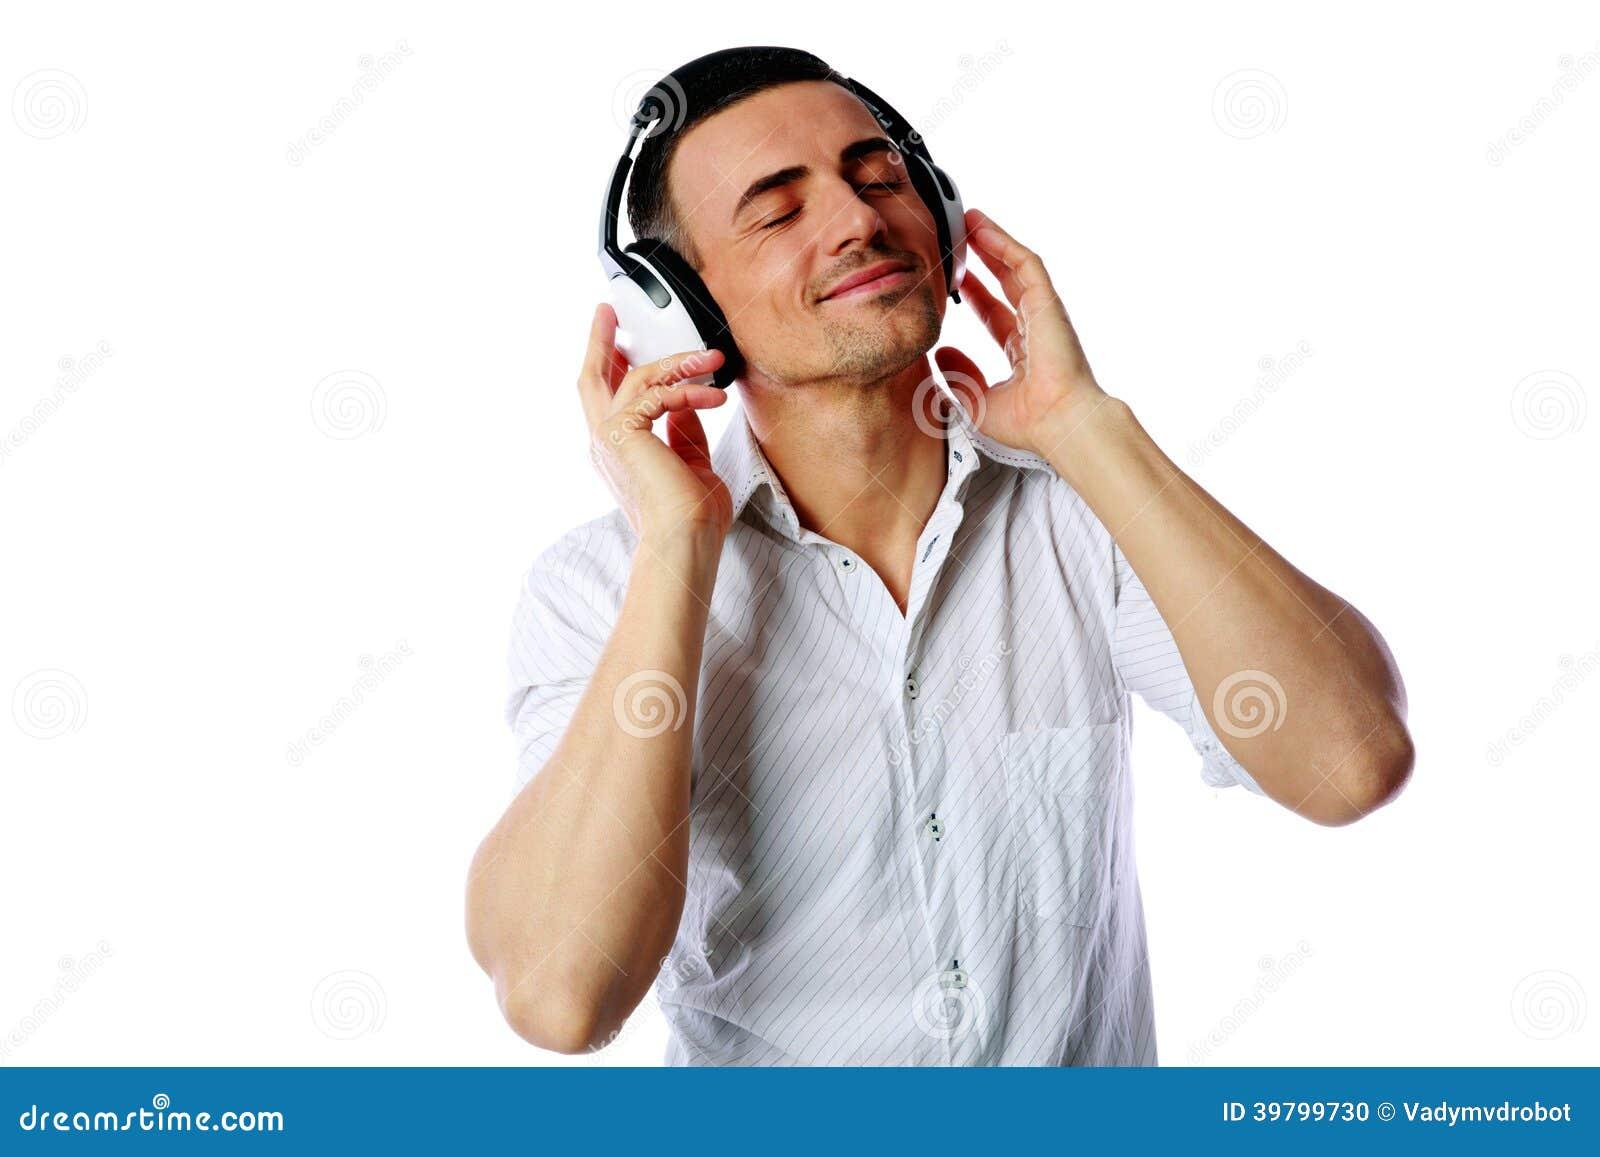 Man With Headphones Listening To Music Stock Photo - Image ...